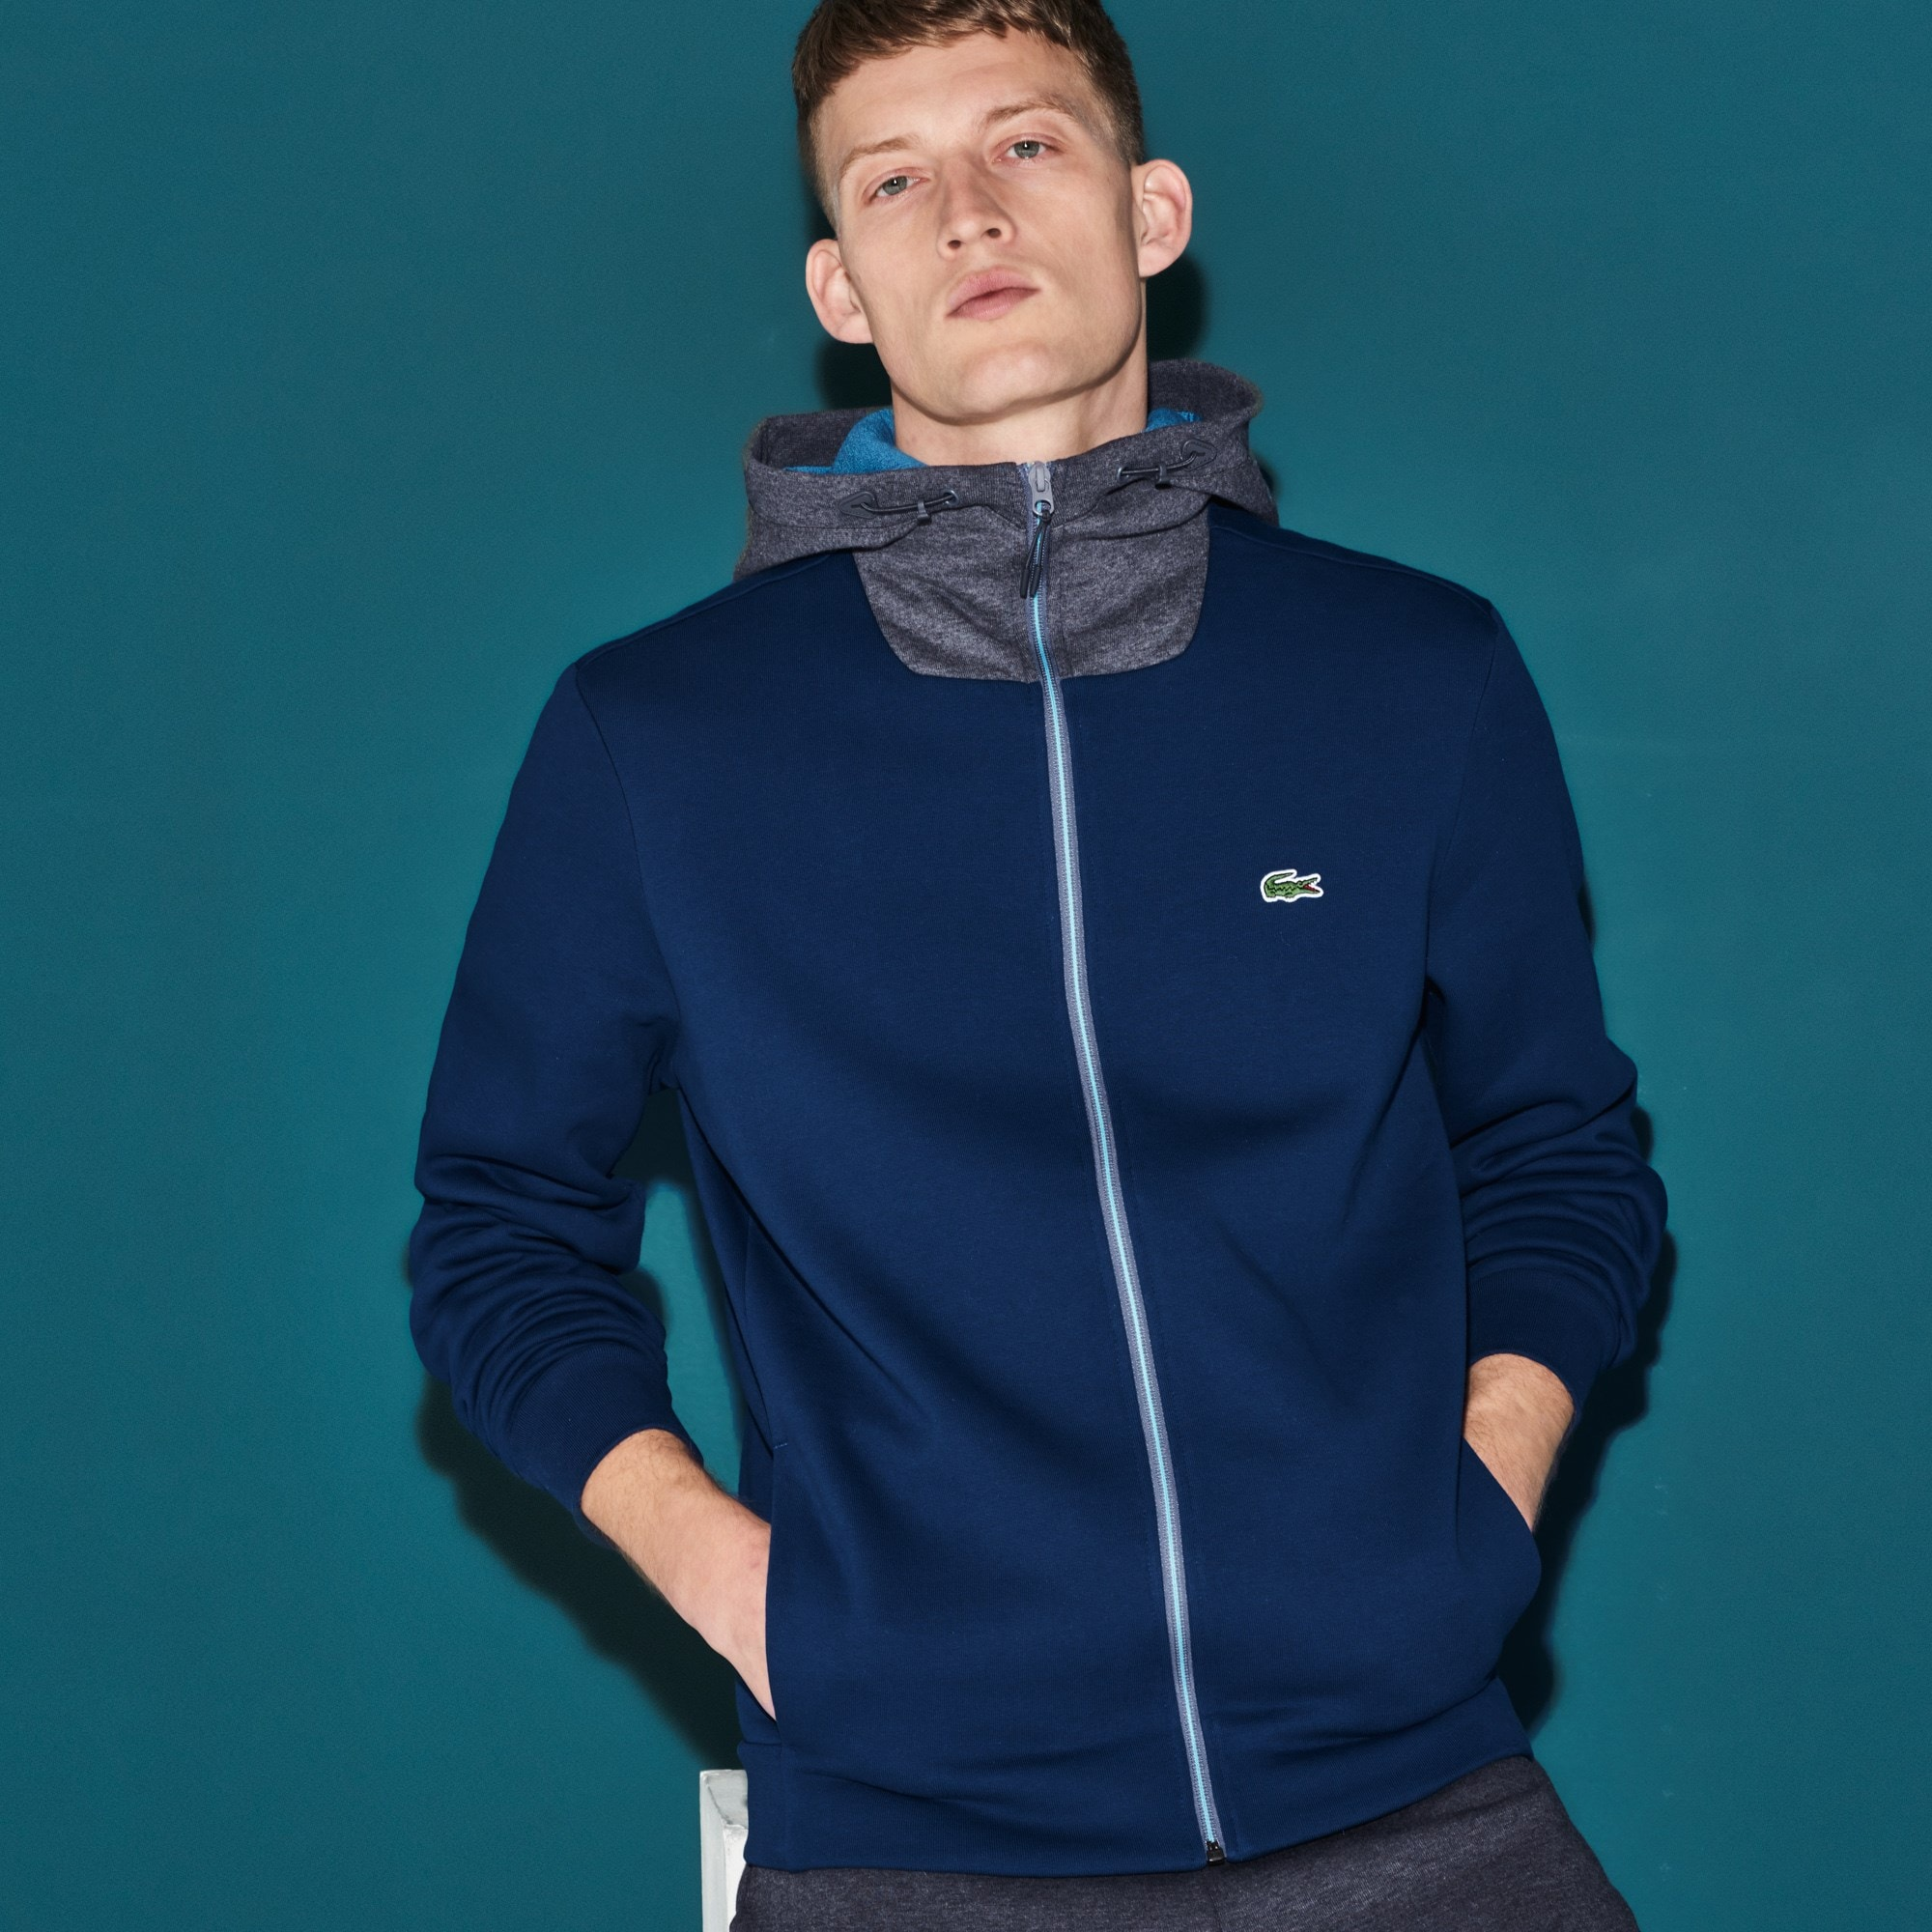 Herren LACOSTE SPORT zweifarbiges Tennis Sweatshirt aus Fleece